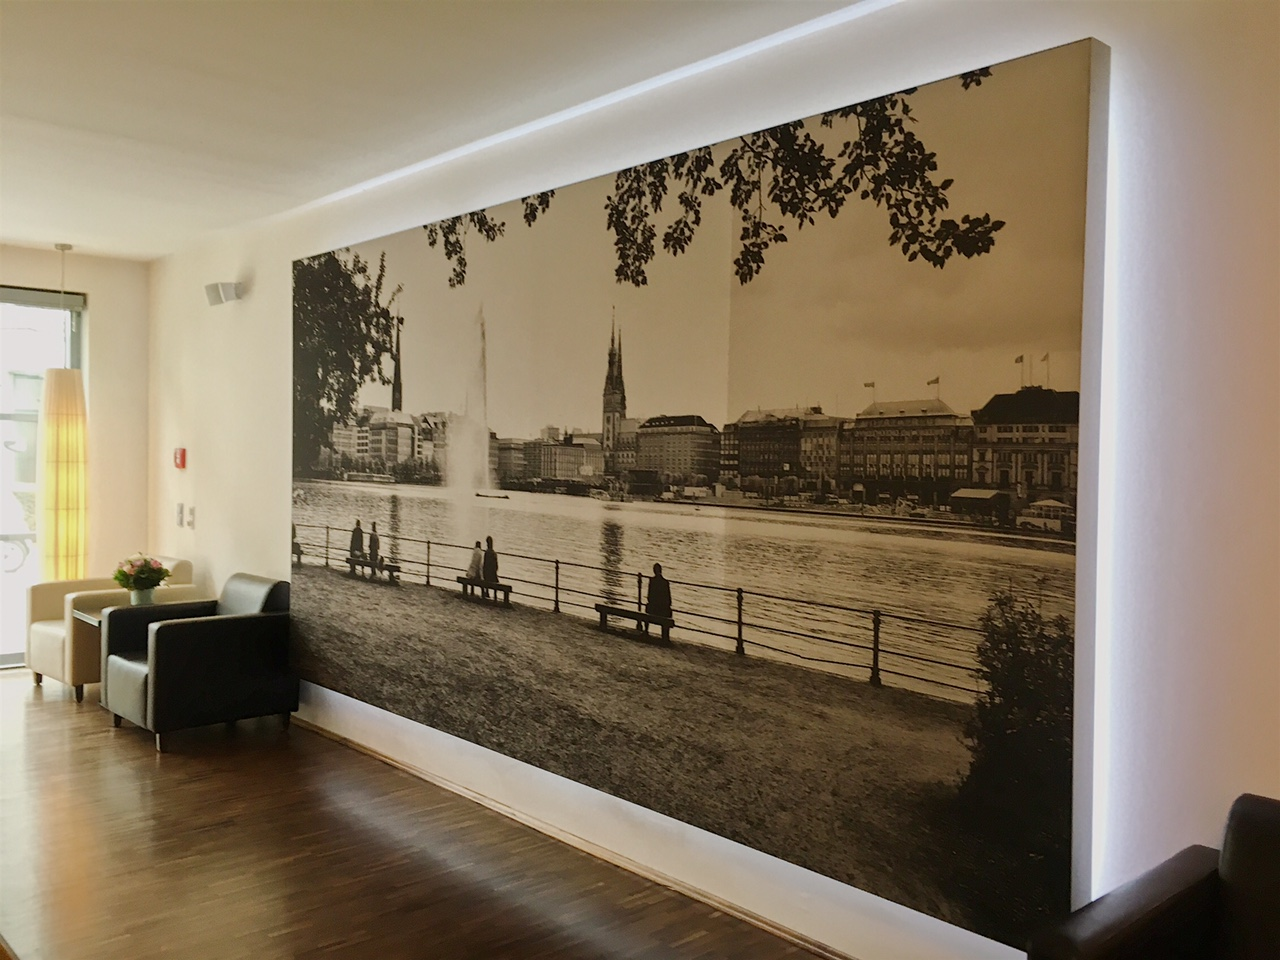 Heikotel Hamburg hotel - Hotel Am Stadtpark: Reception